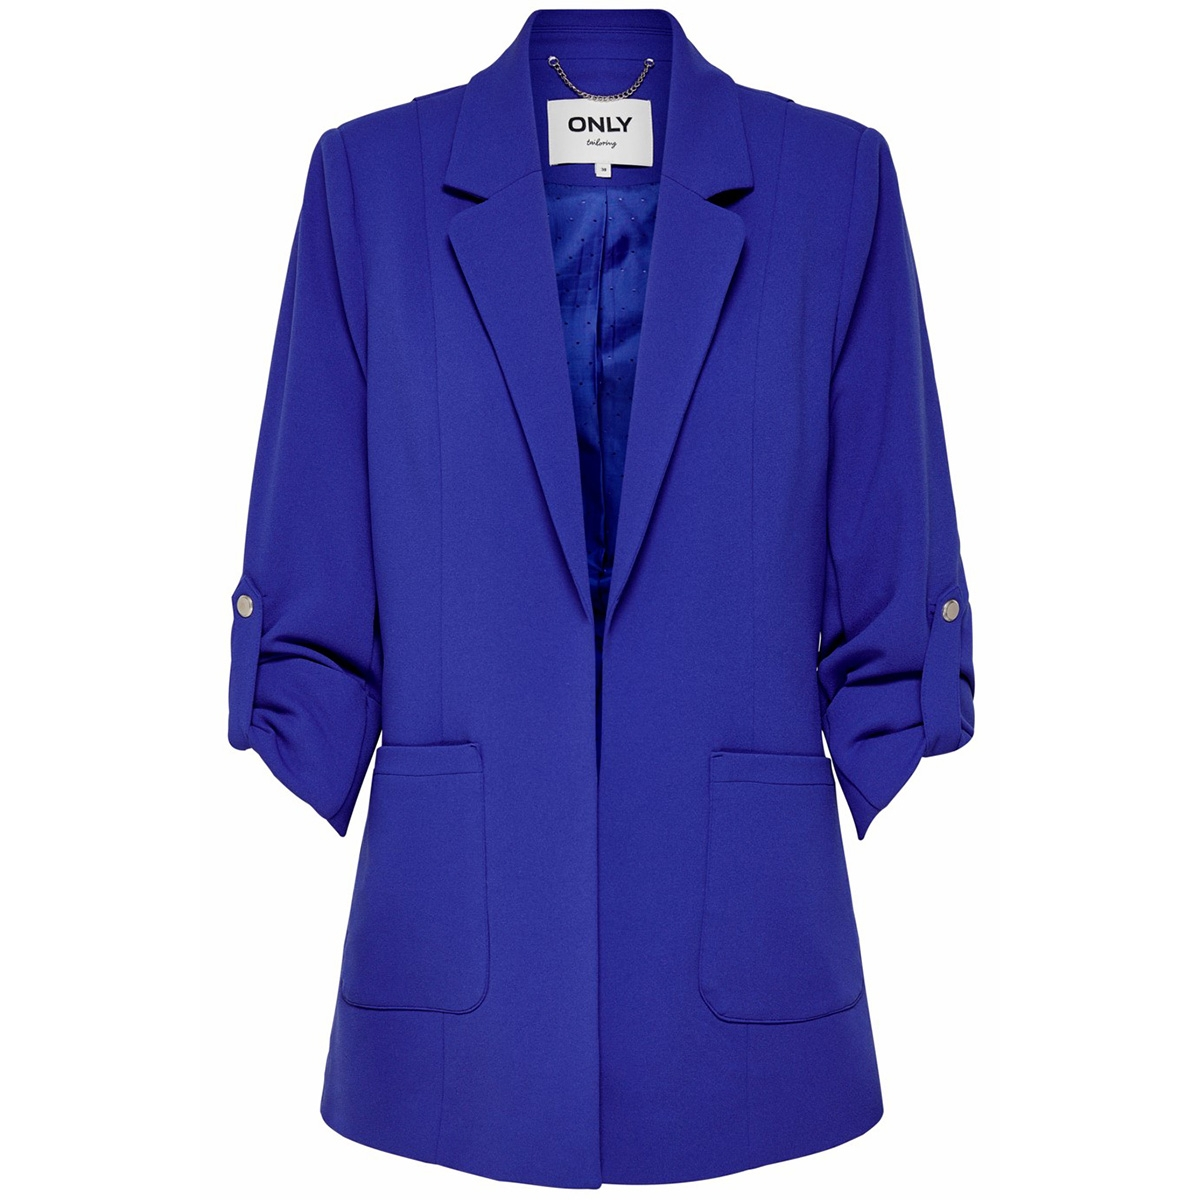 onlkayla-rocky 3/4 blazer tlr 15198947 only blazer spectrum blue